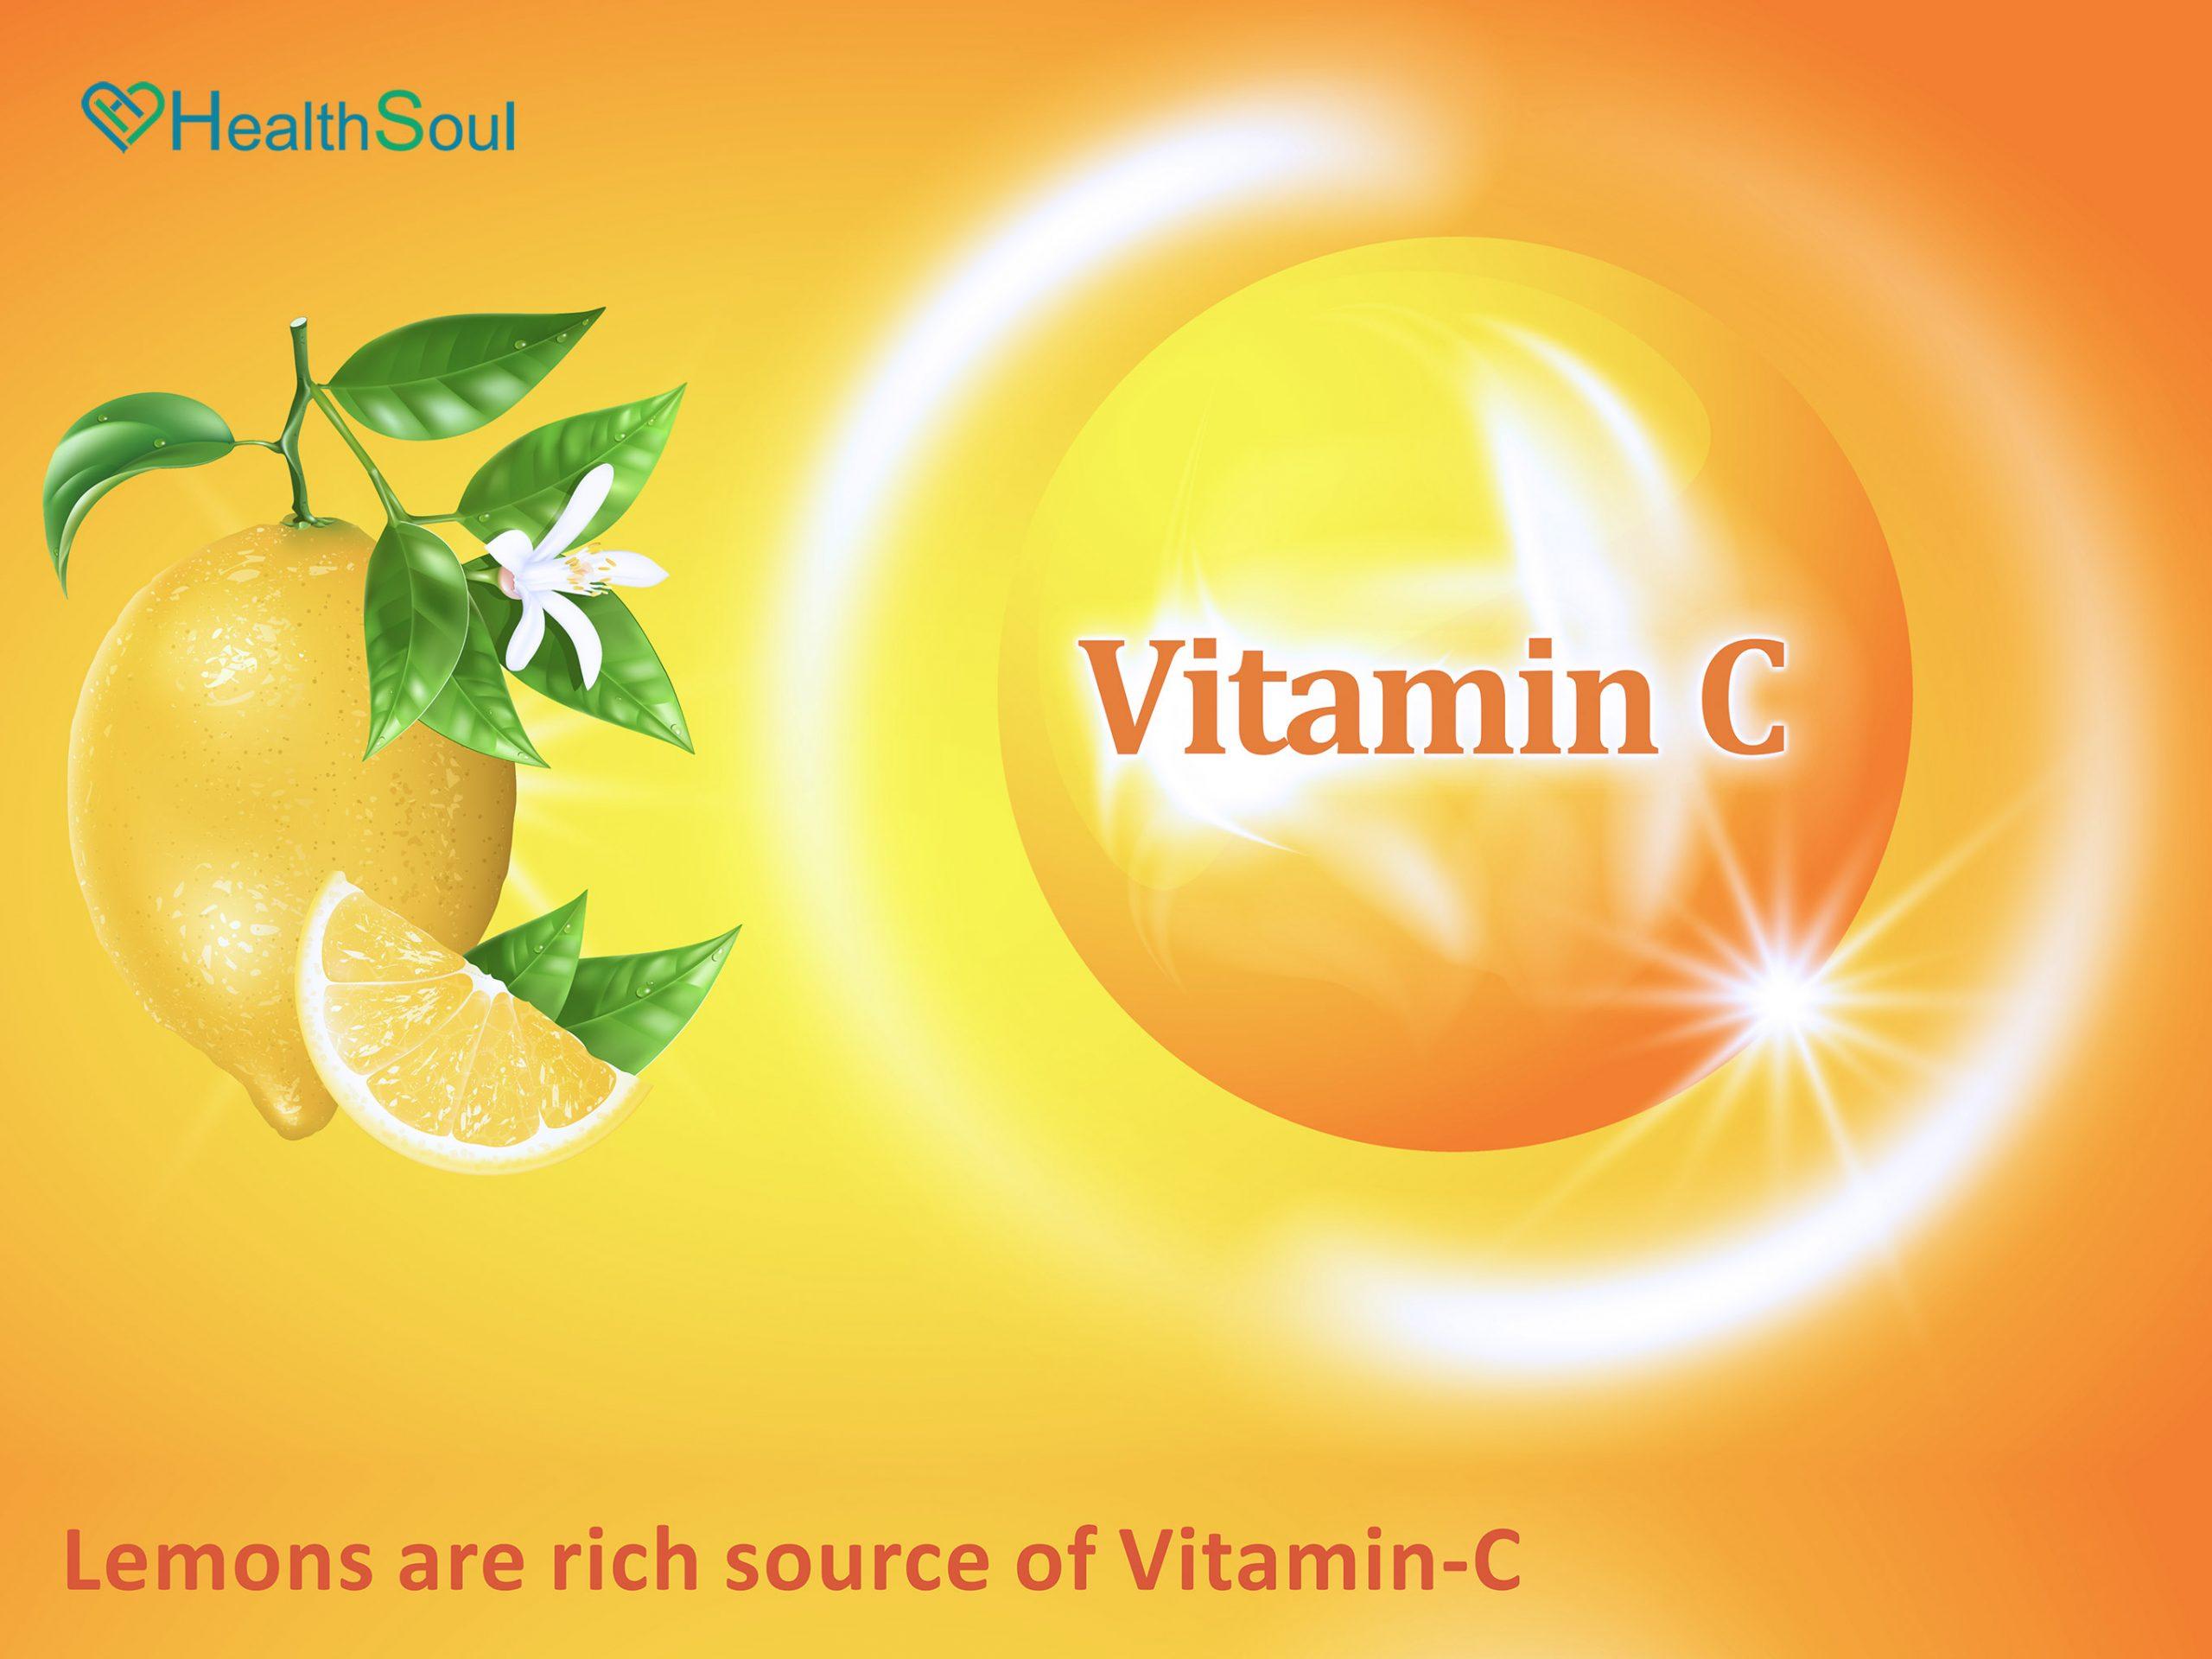 Lemons Rich Source of Vitamin C